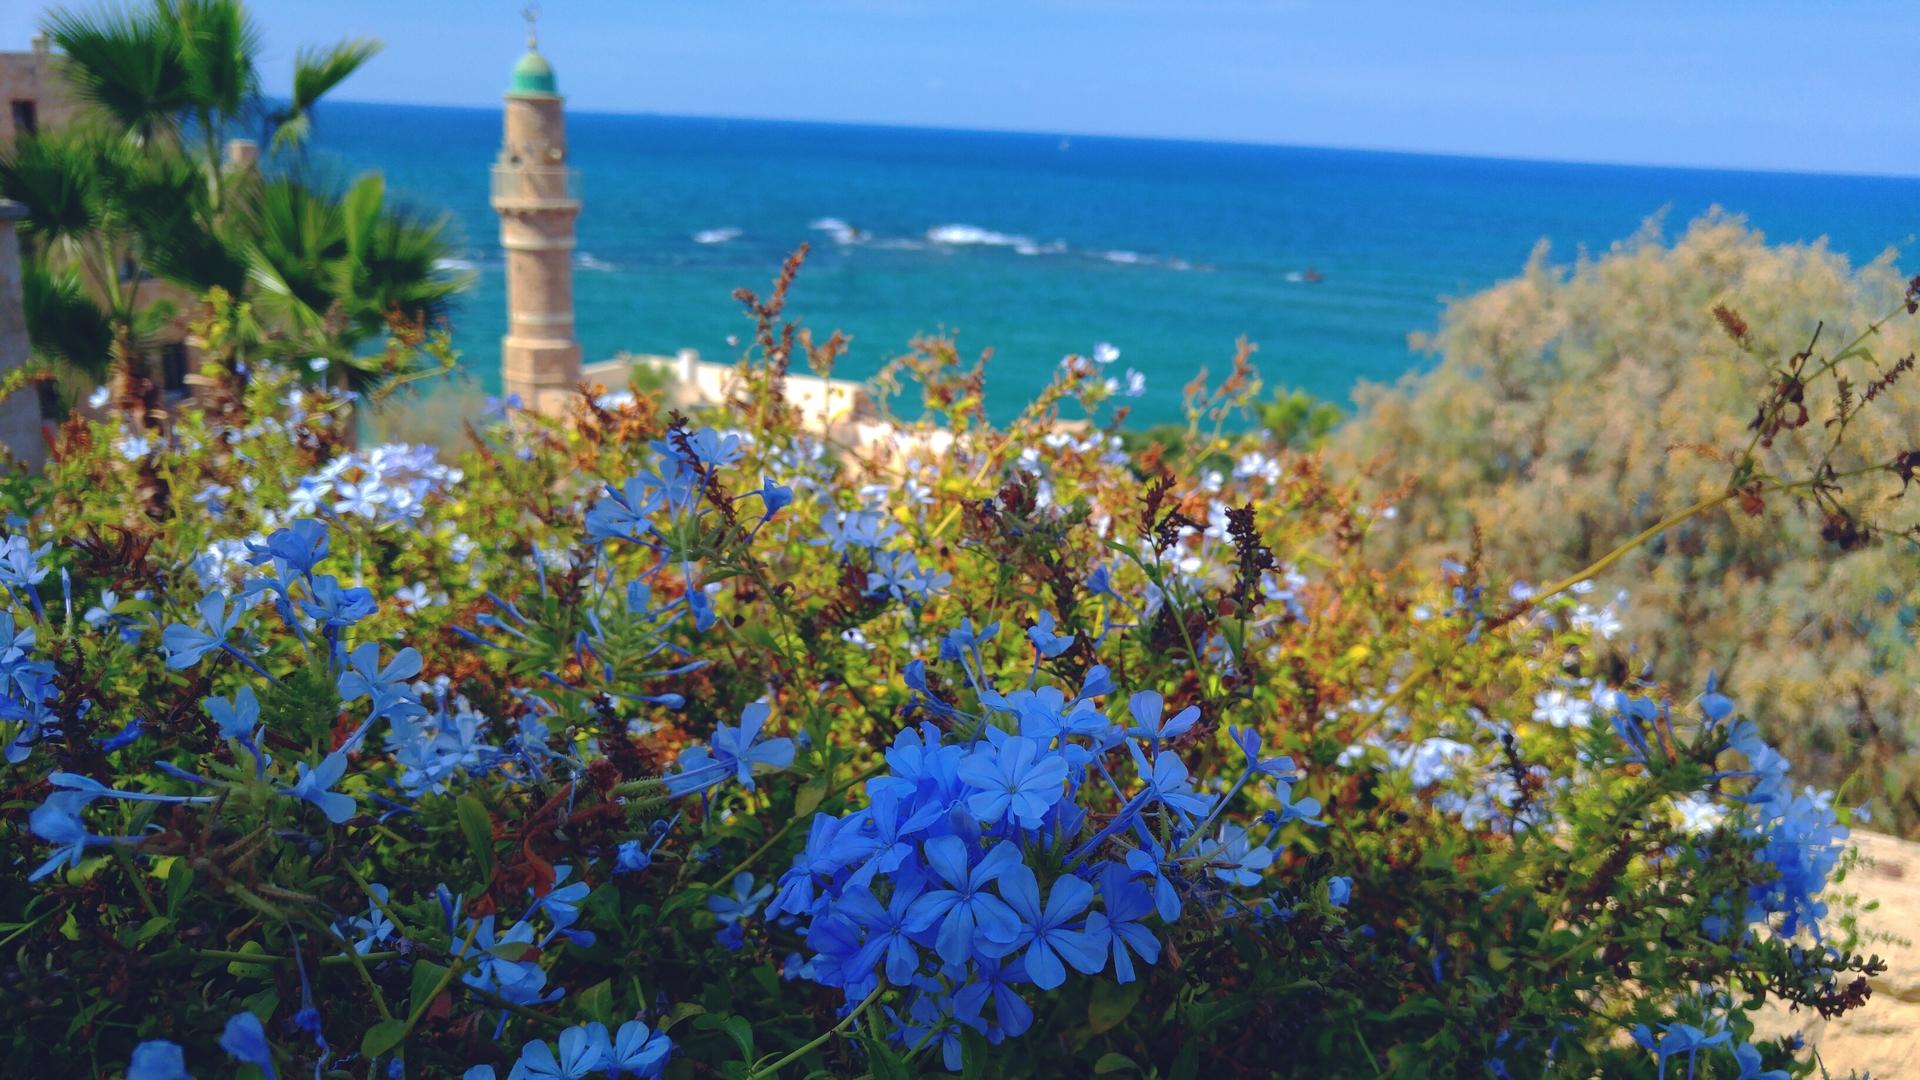 Close-up of blue flowers | flower, wildflower, sea, closeup